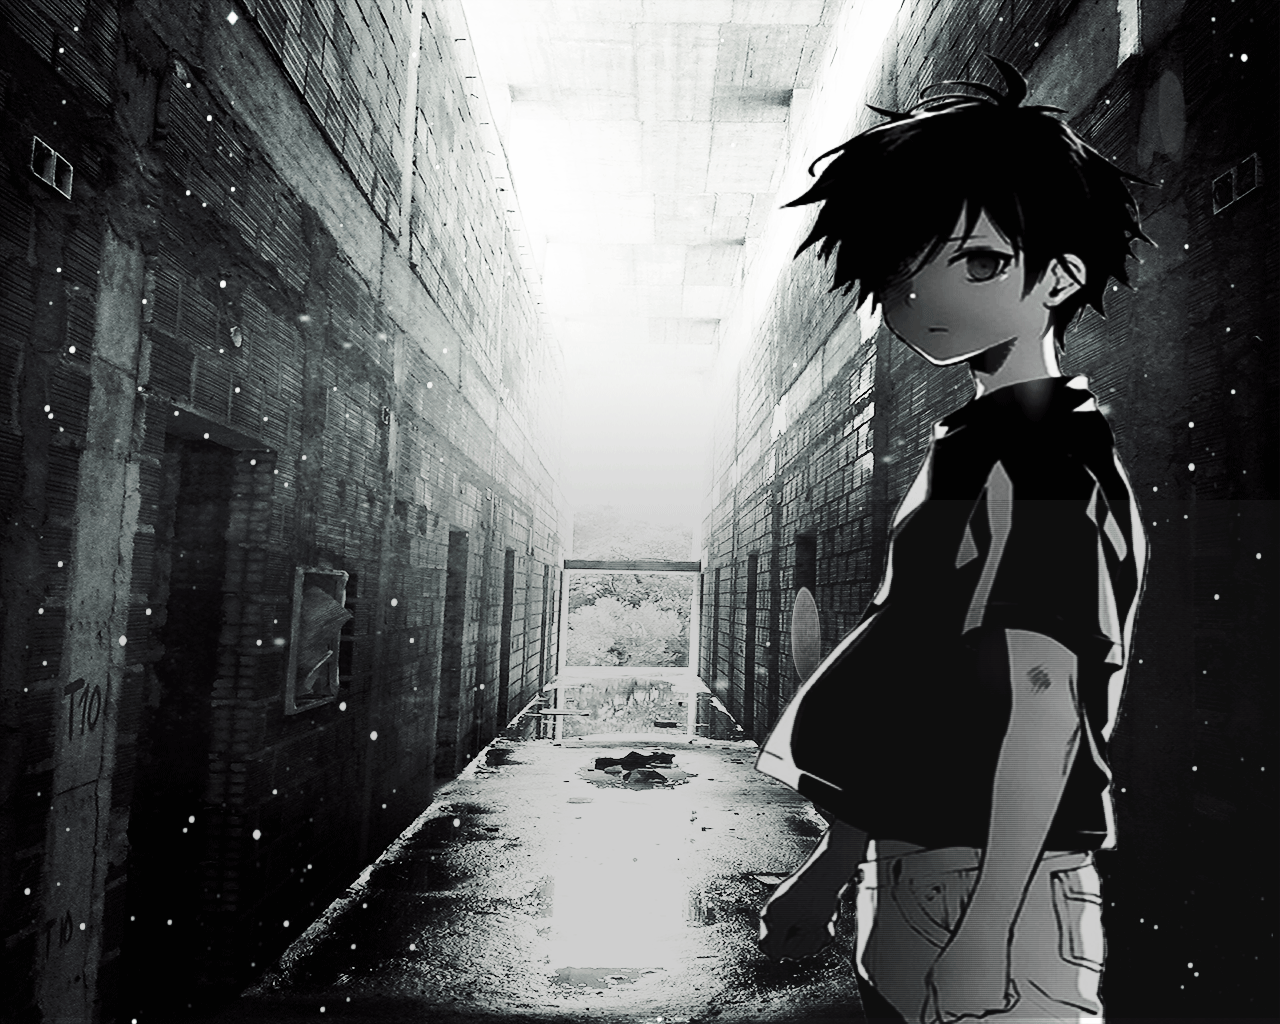 Anime Broken Heart Boy Wallpapers - Wallpaper Cave